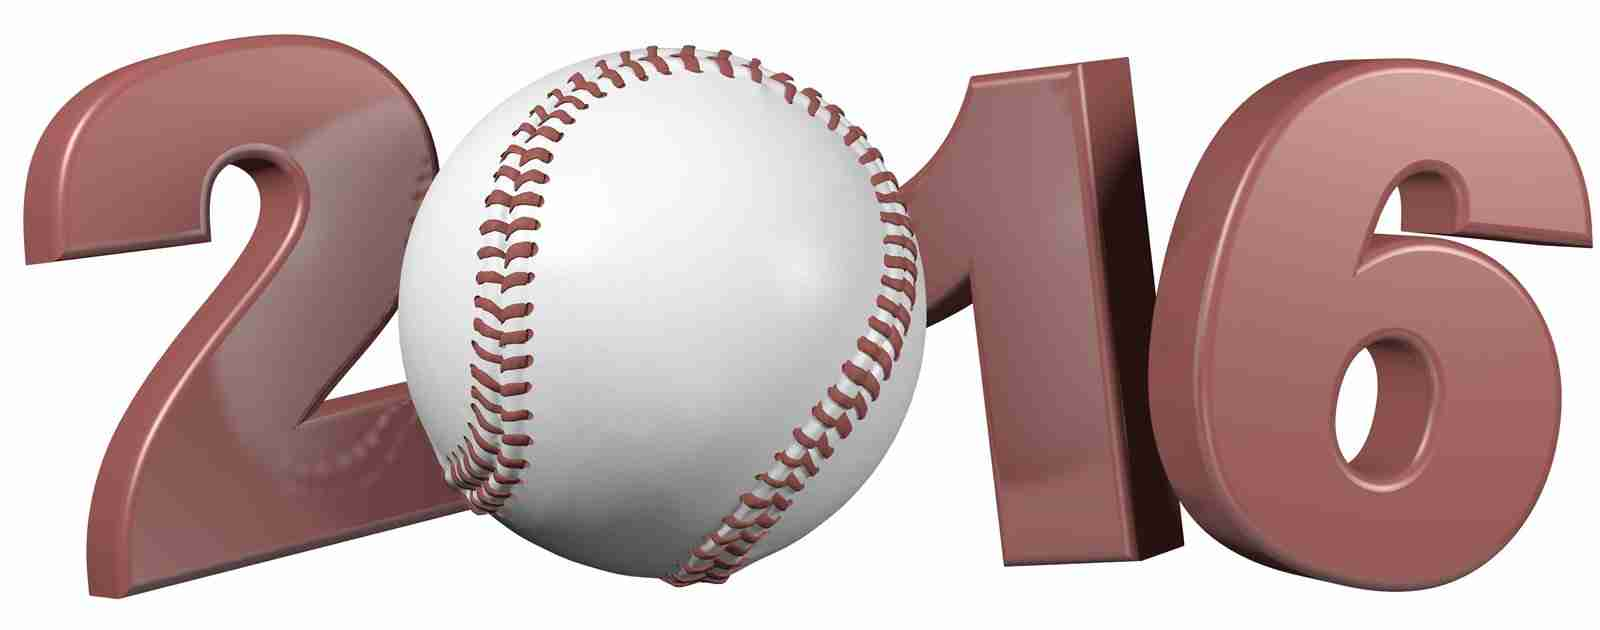 2016 O'Connor Baseball